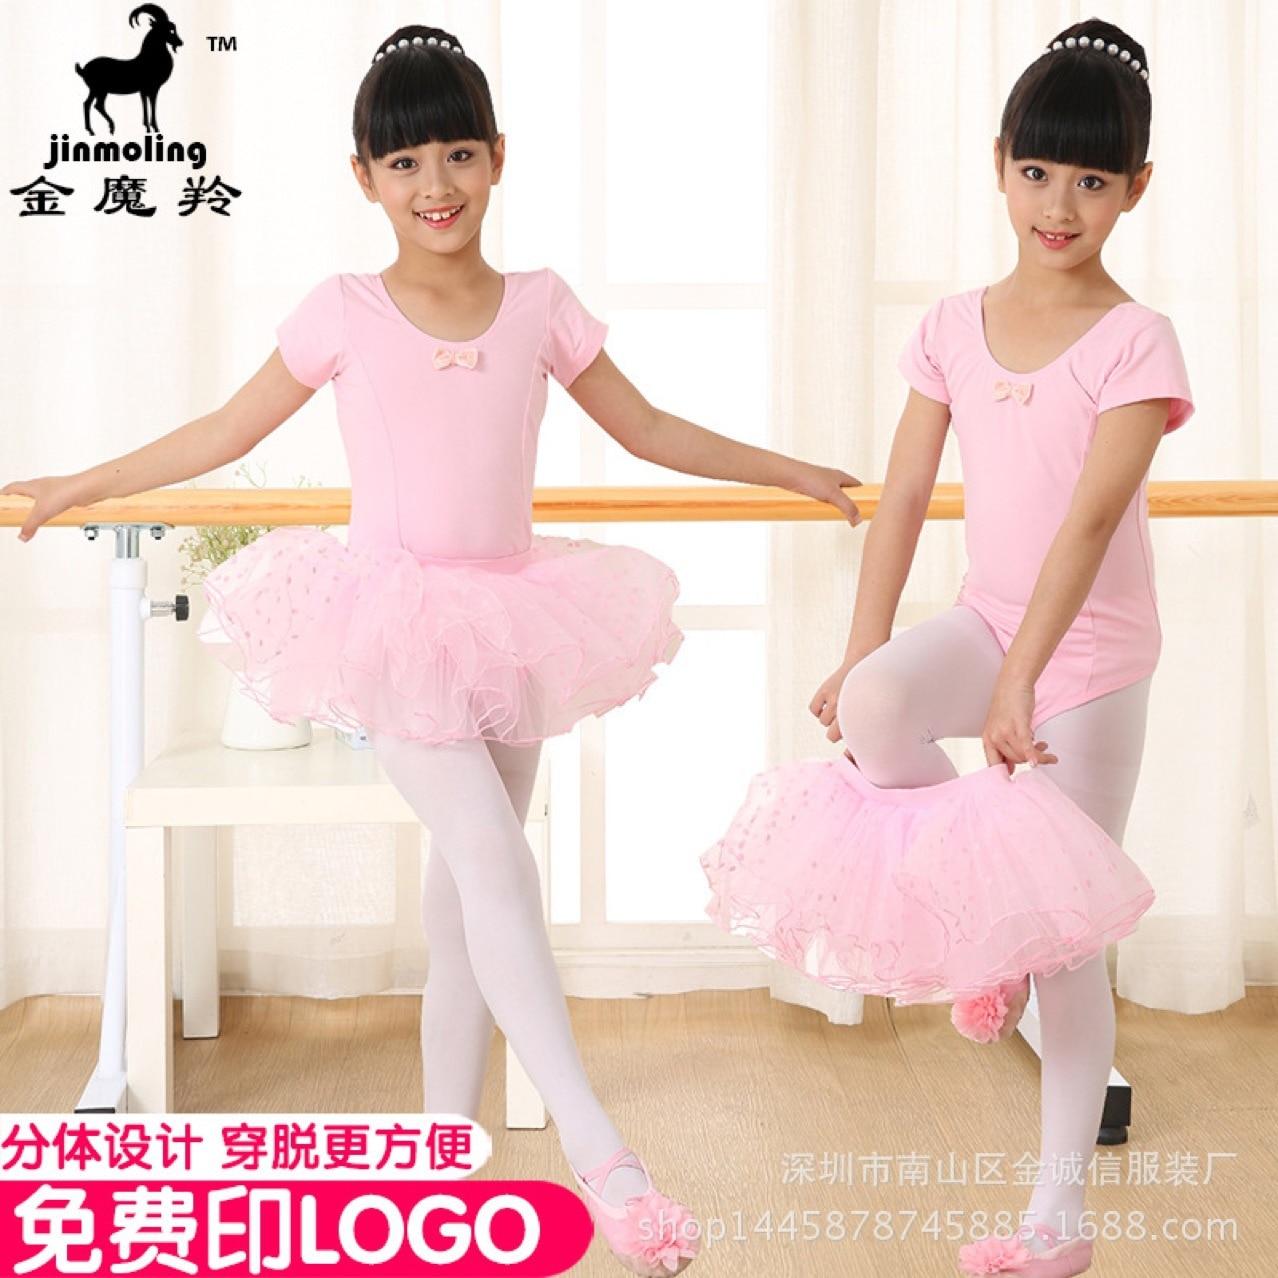 CHILDREN'S Dancing Clothes CHILDREN'S Ballet Dance Skirt Girls' Short Sleeve Shirt CHILDREN'S DAY Performance Performance Gymnas